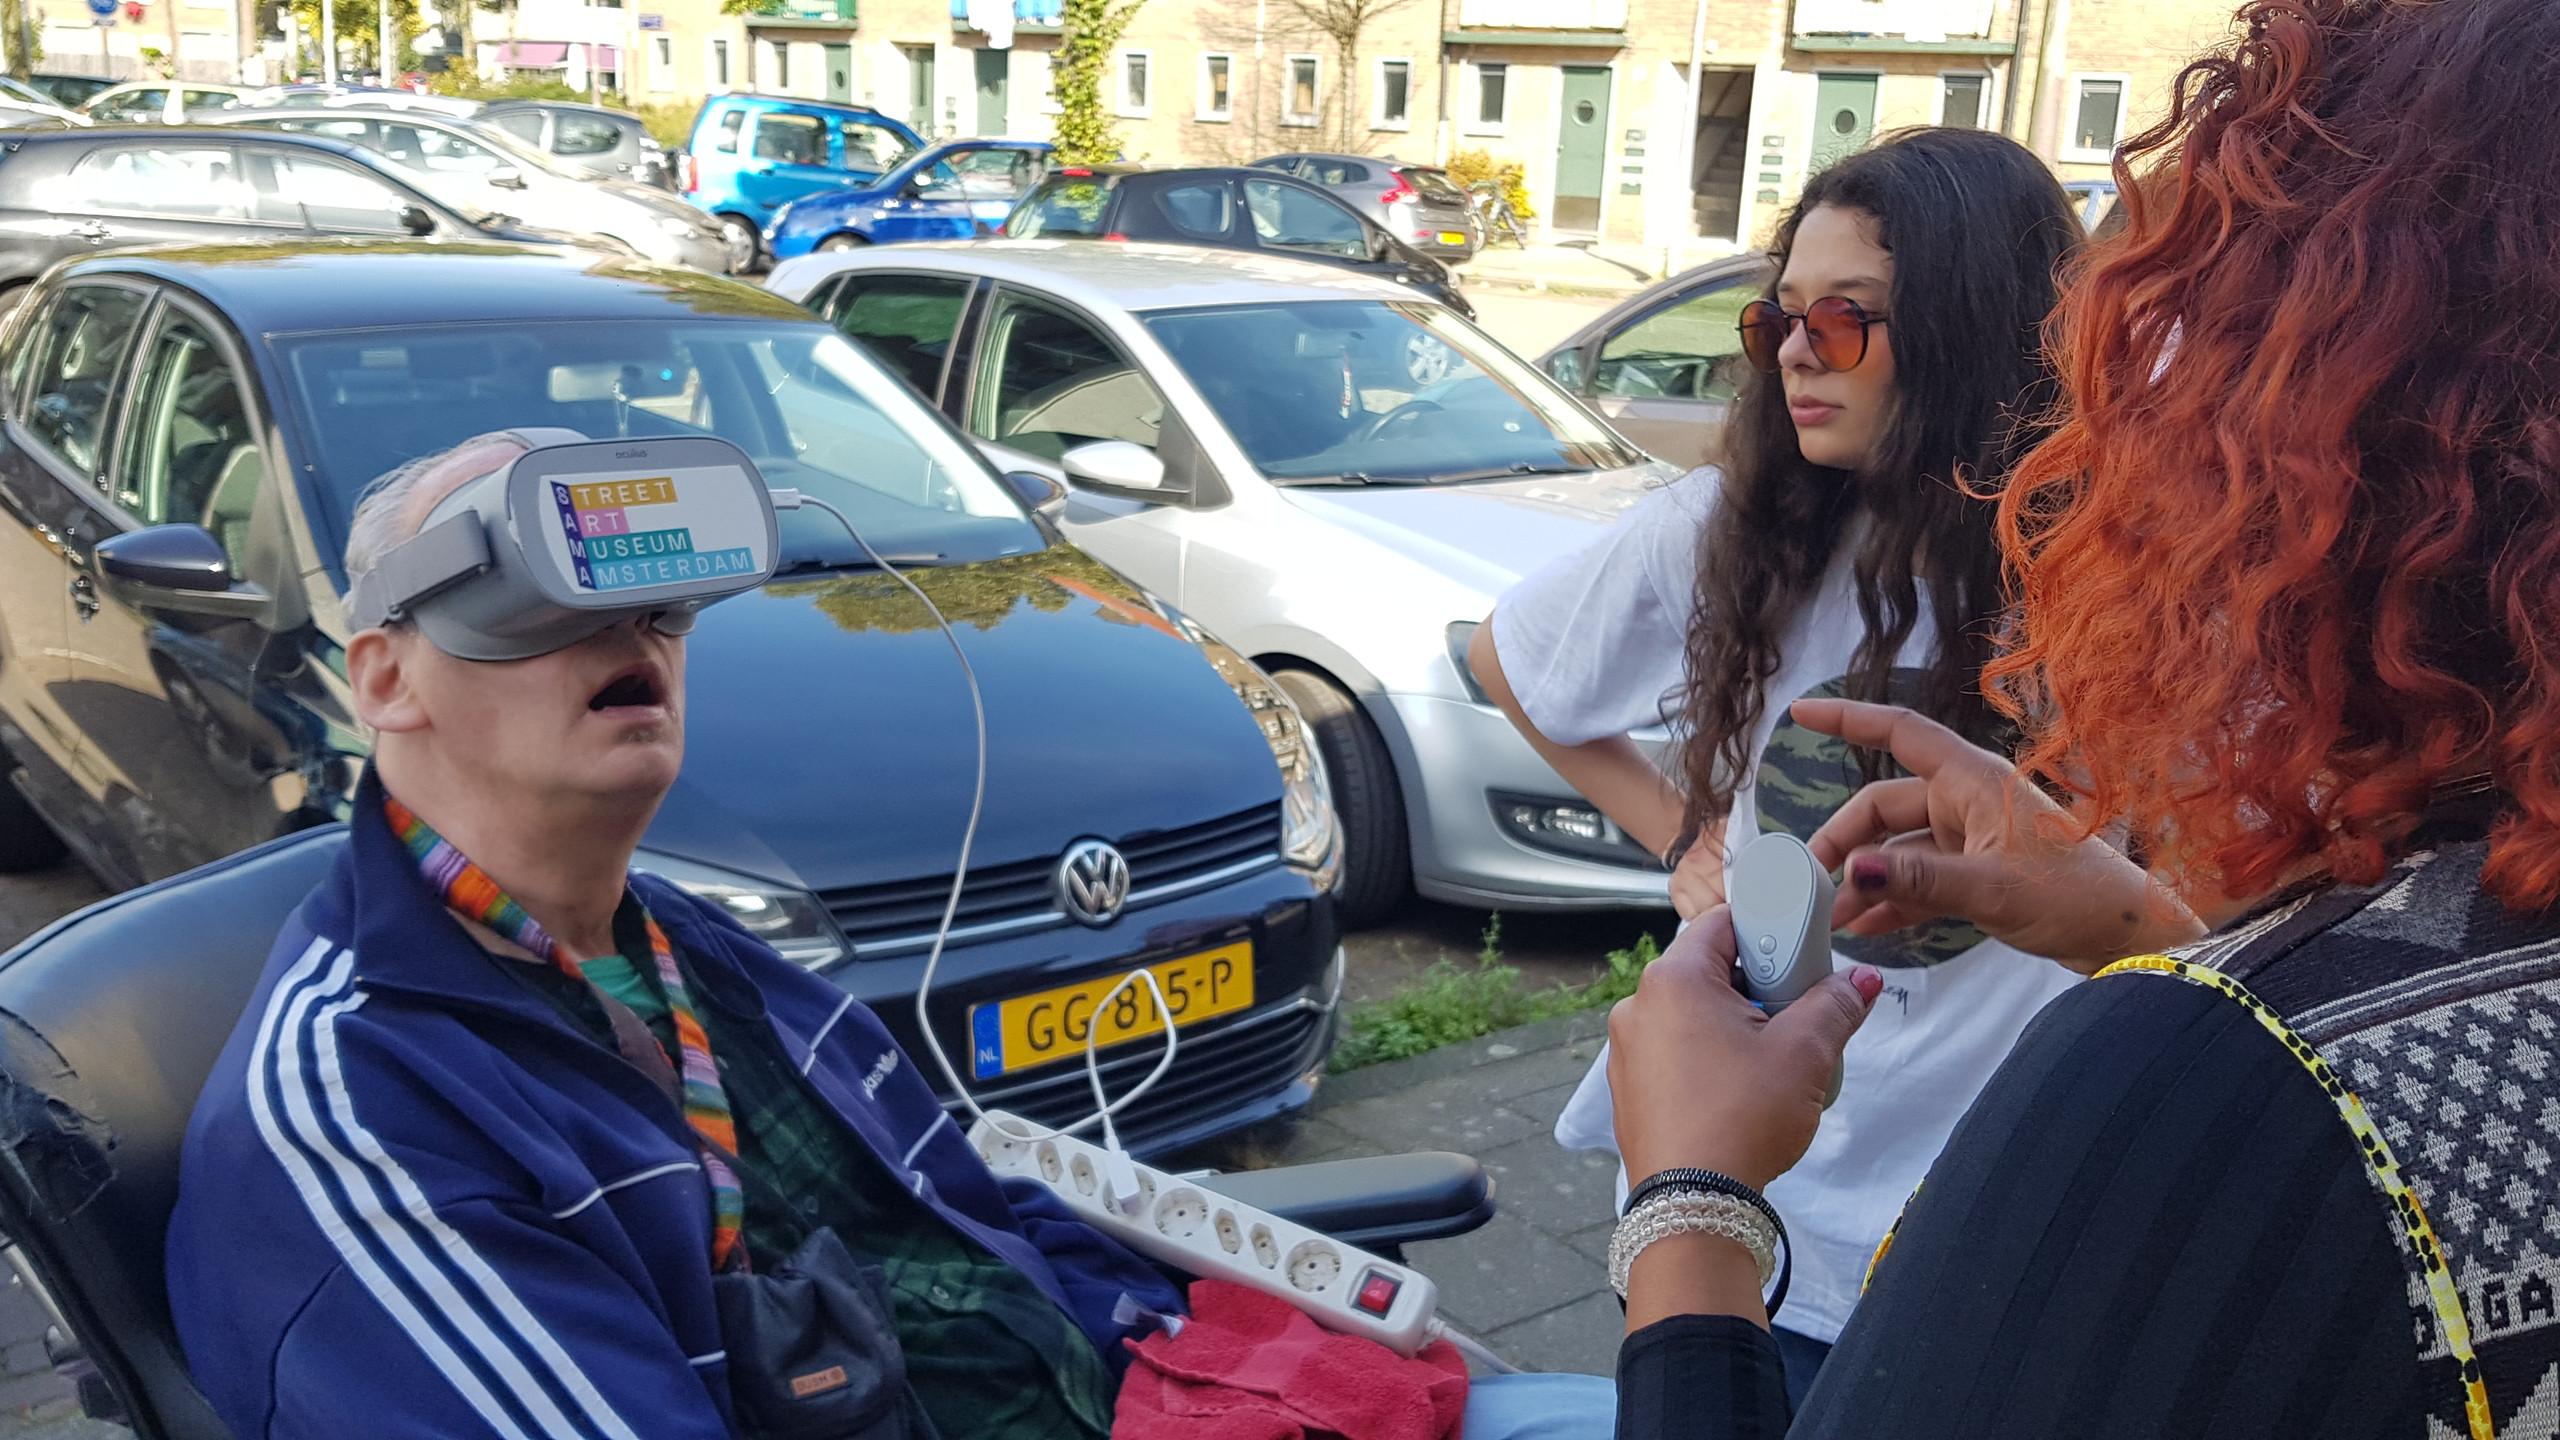 24H Nieuw-West iAmsterdam September 2019